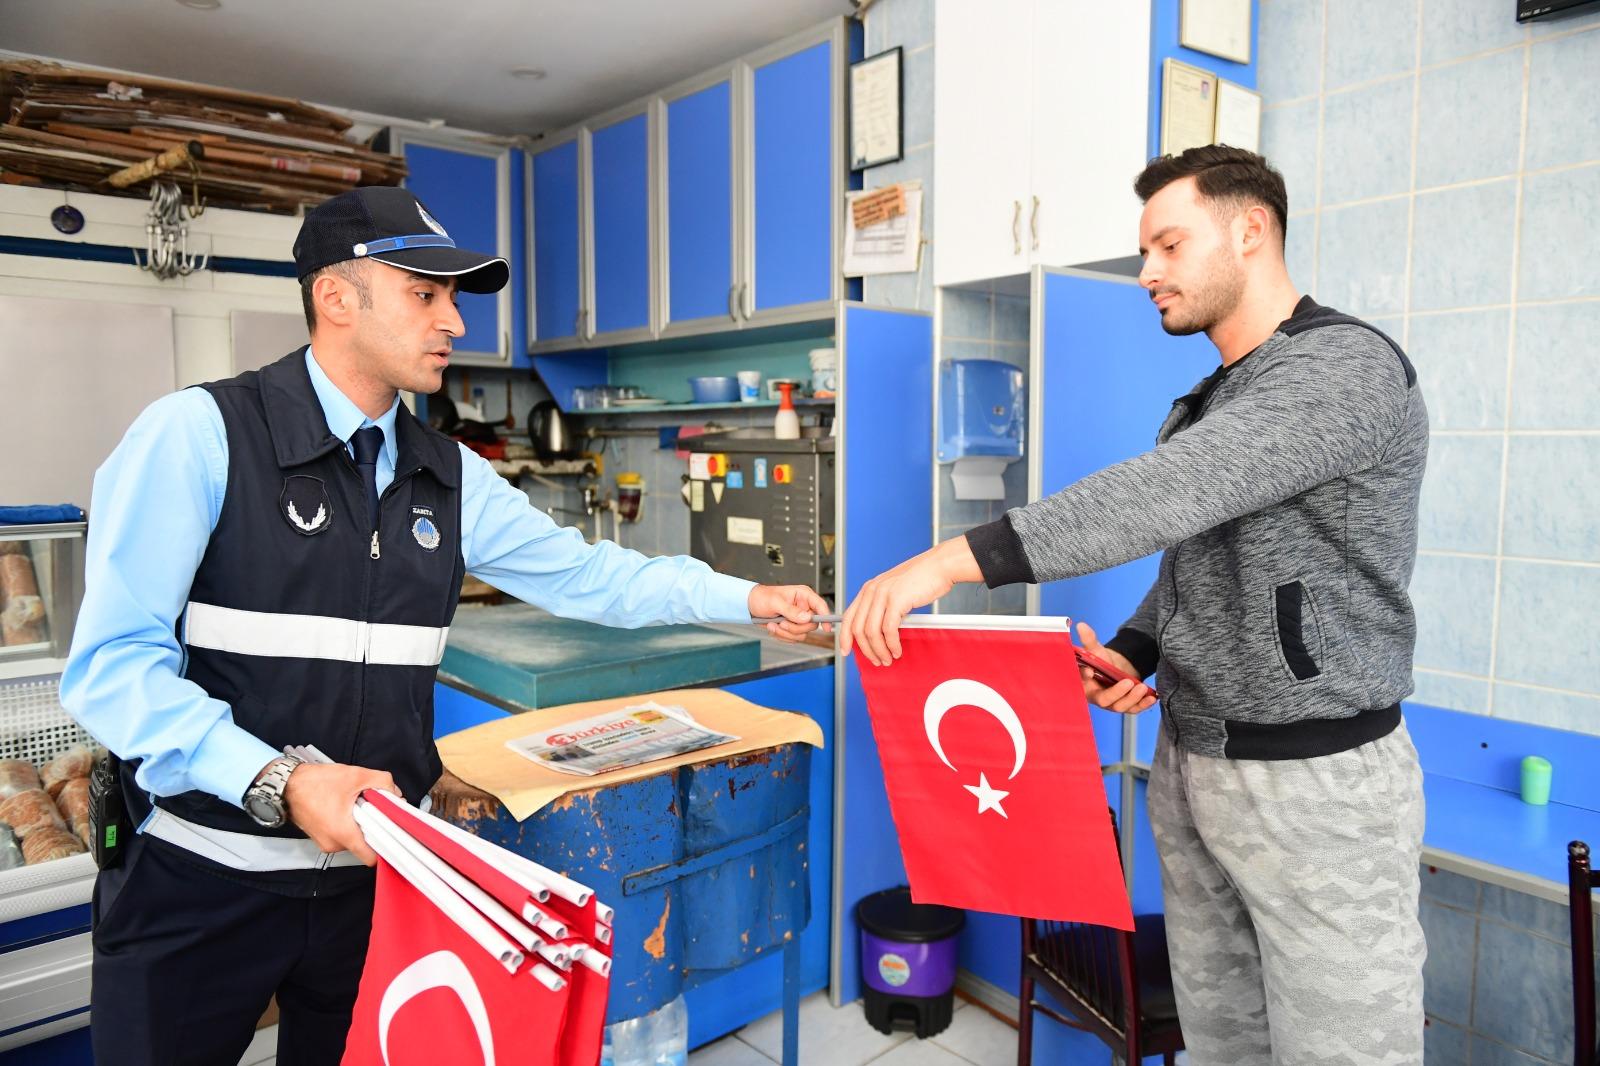 ALTINORDU BELEDİYESİ'NDEN 'BARIŞ PINARI HAREKATI'NA ANLAMLI DESTEK